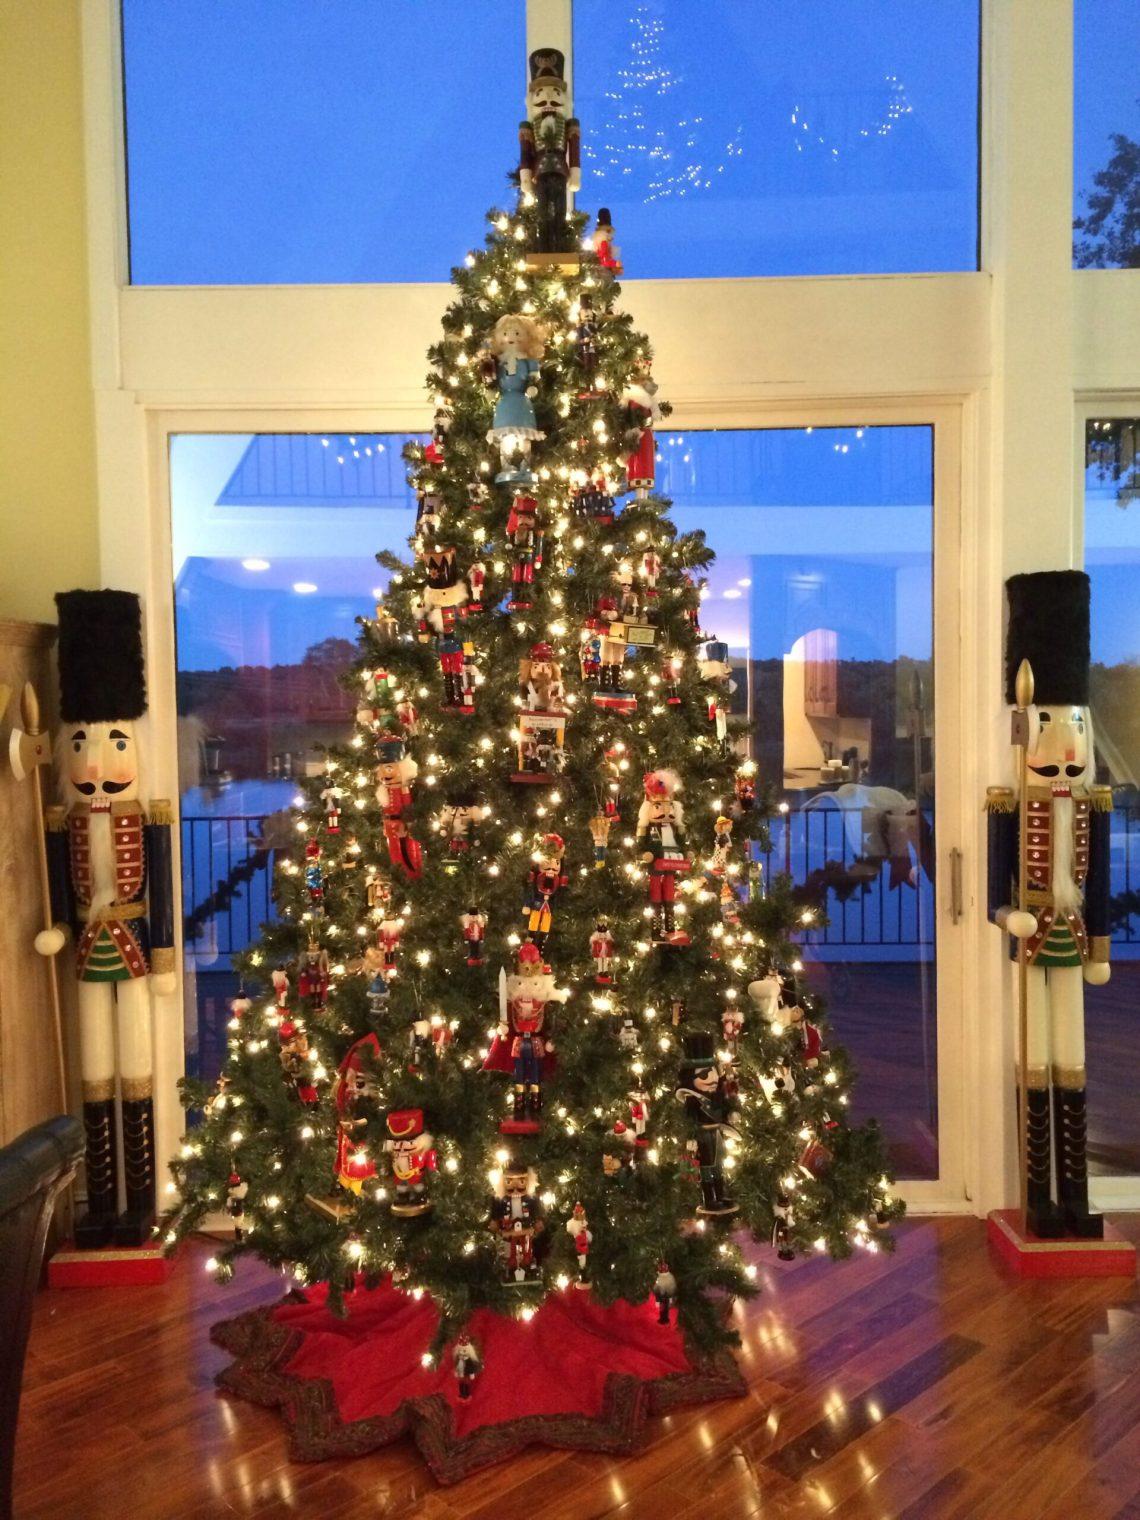 Nutcracker Themed Christmas Tree Image